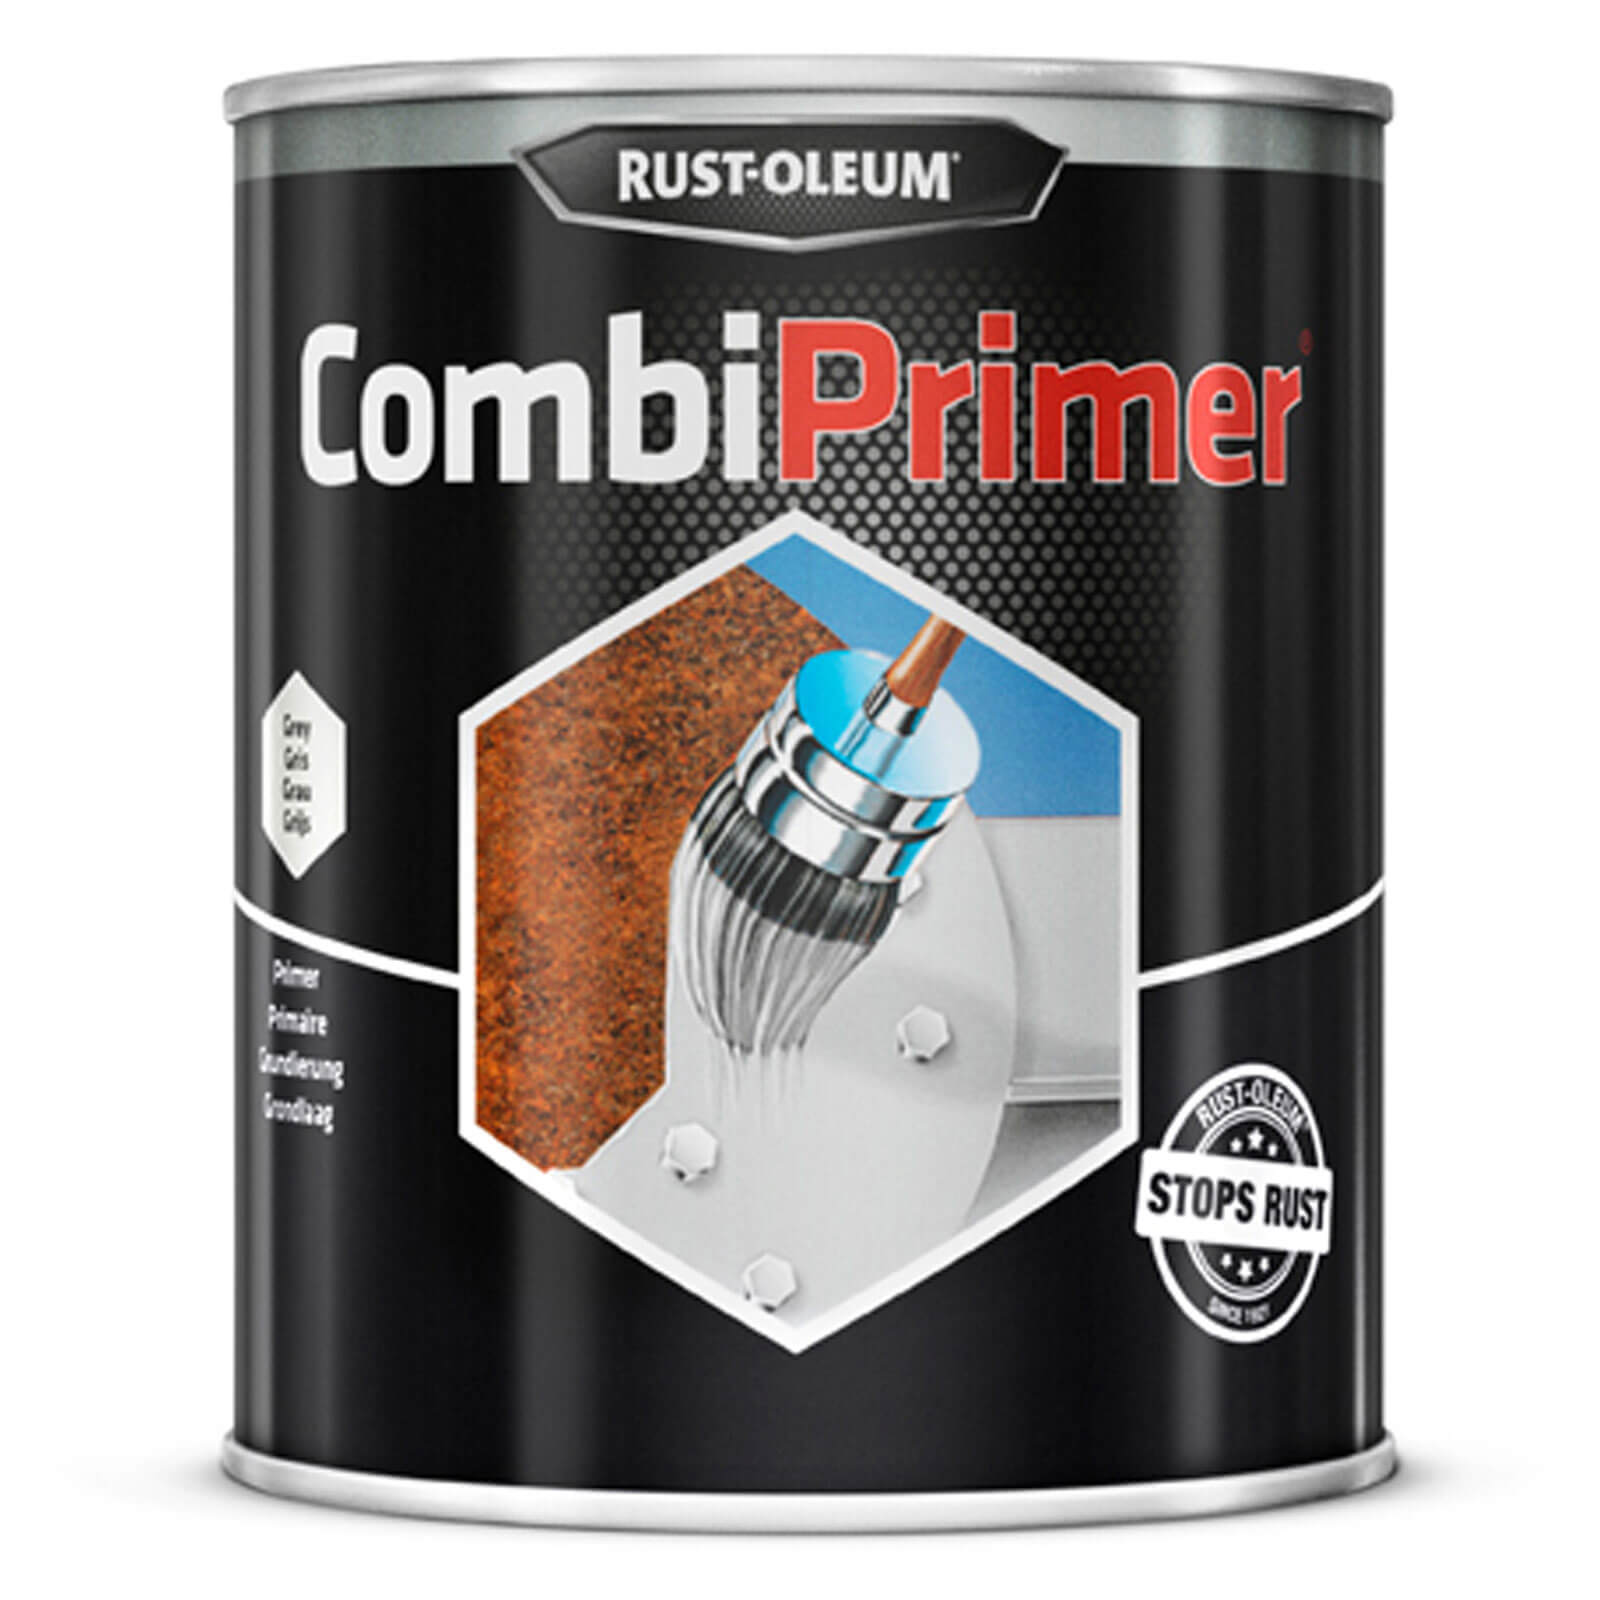 Rust Oleum CombiPrimer Anti Rust Metal Primer Paint Grey 750ml